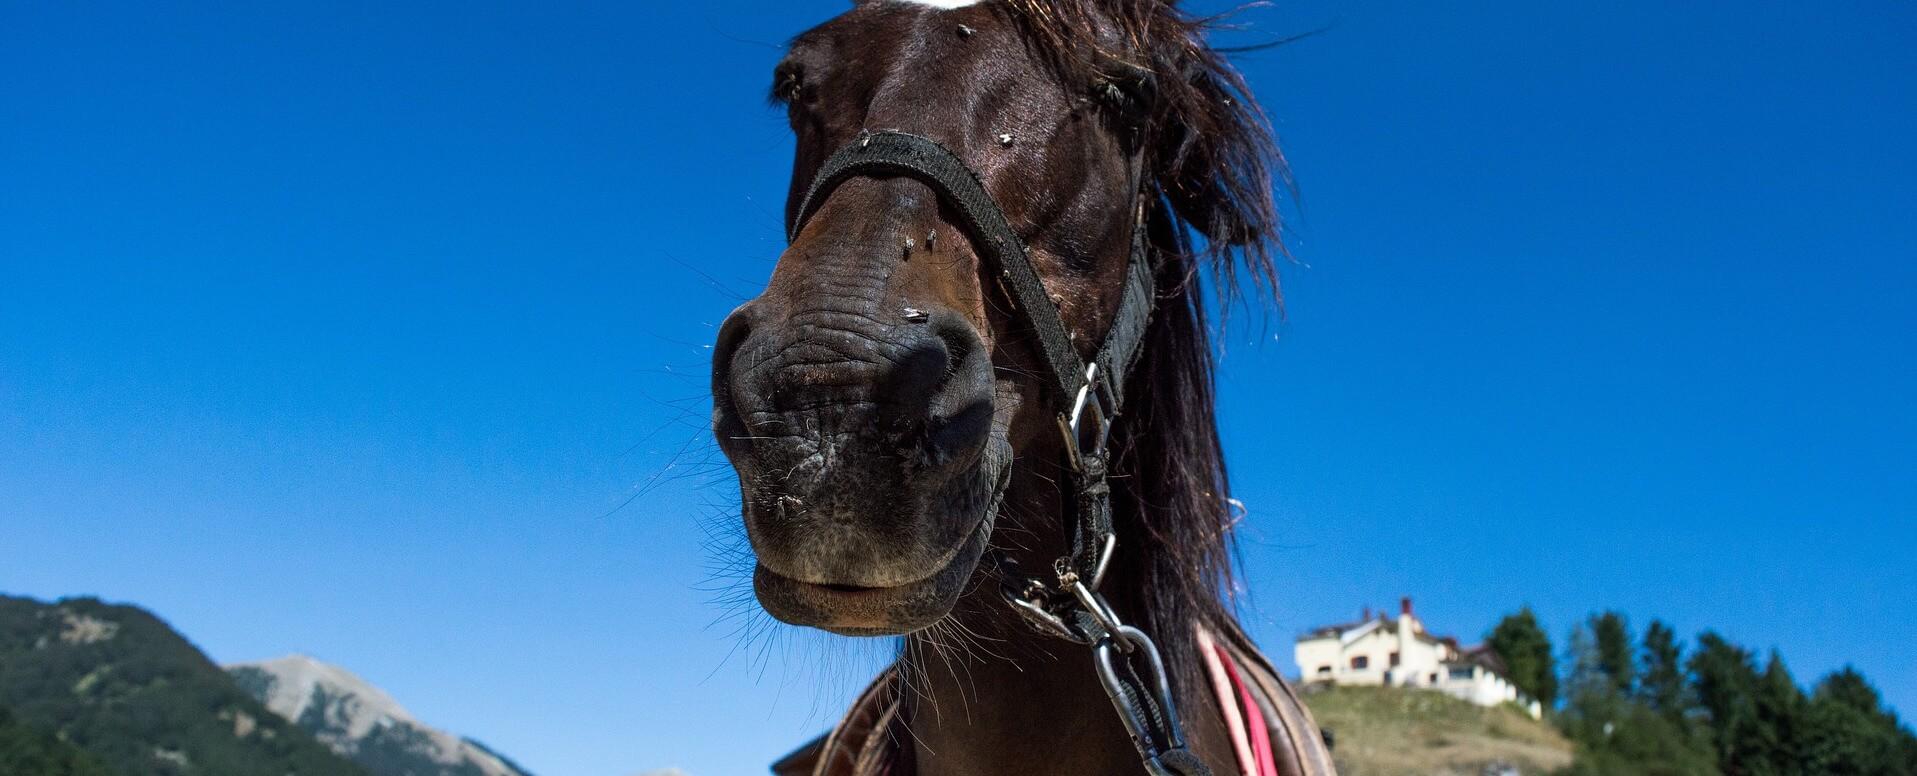 Balades à cheval - Corse